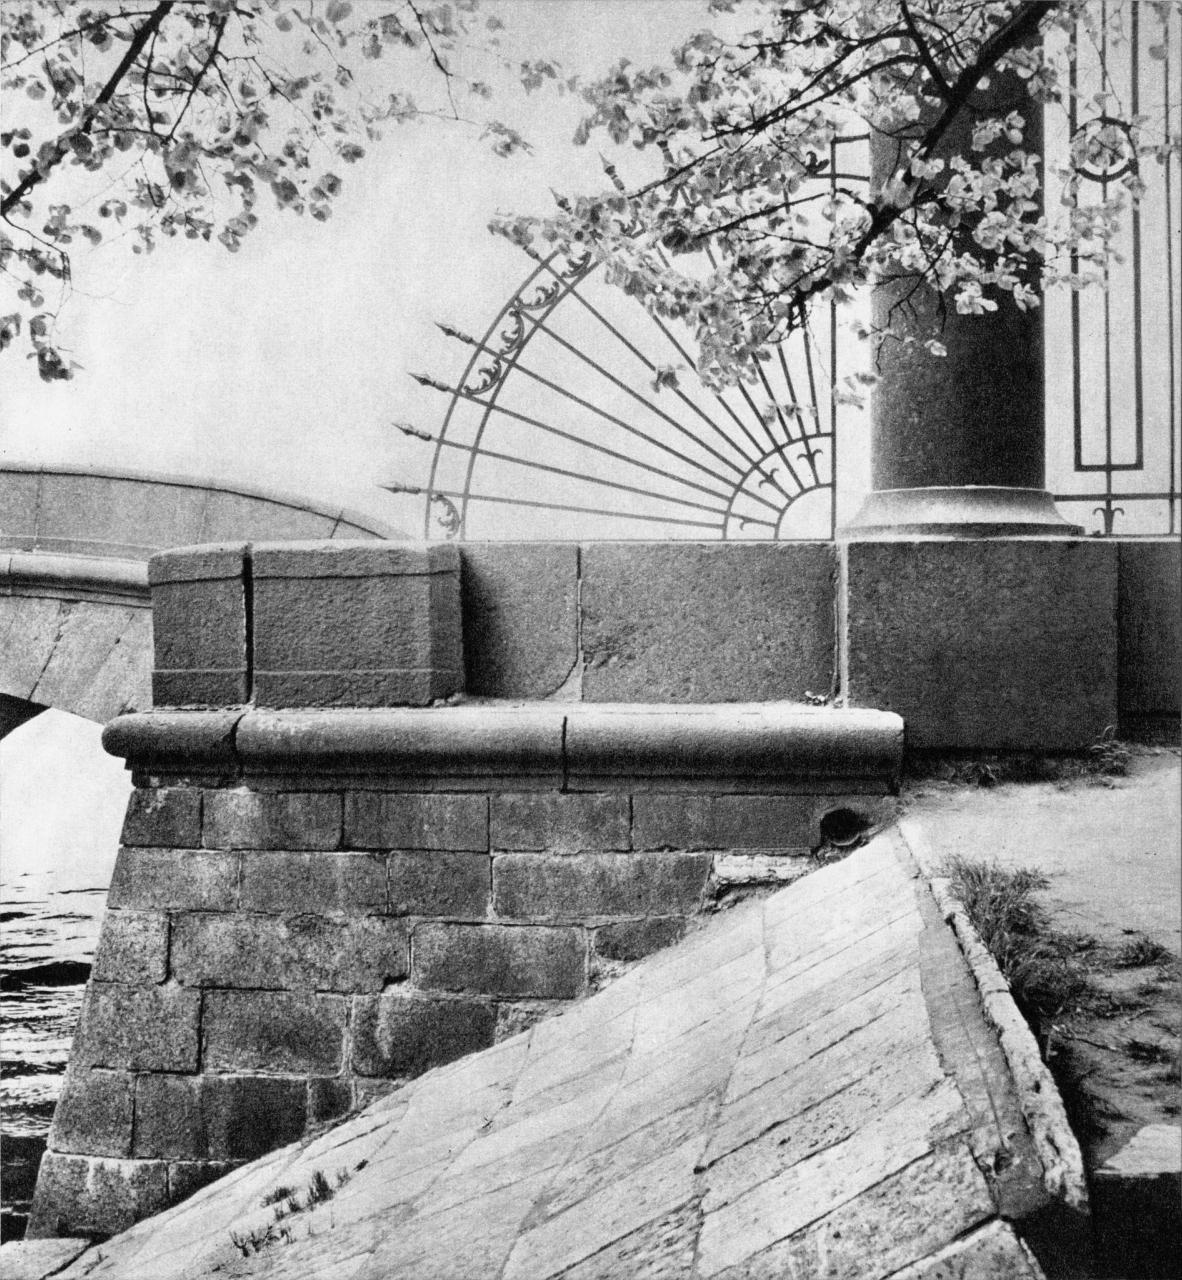 Ограда Летнего сада у Верхне-Лебяжьего моста / Railings of the Summer Gardens near the Upper Swan Bridge